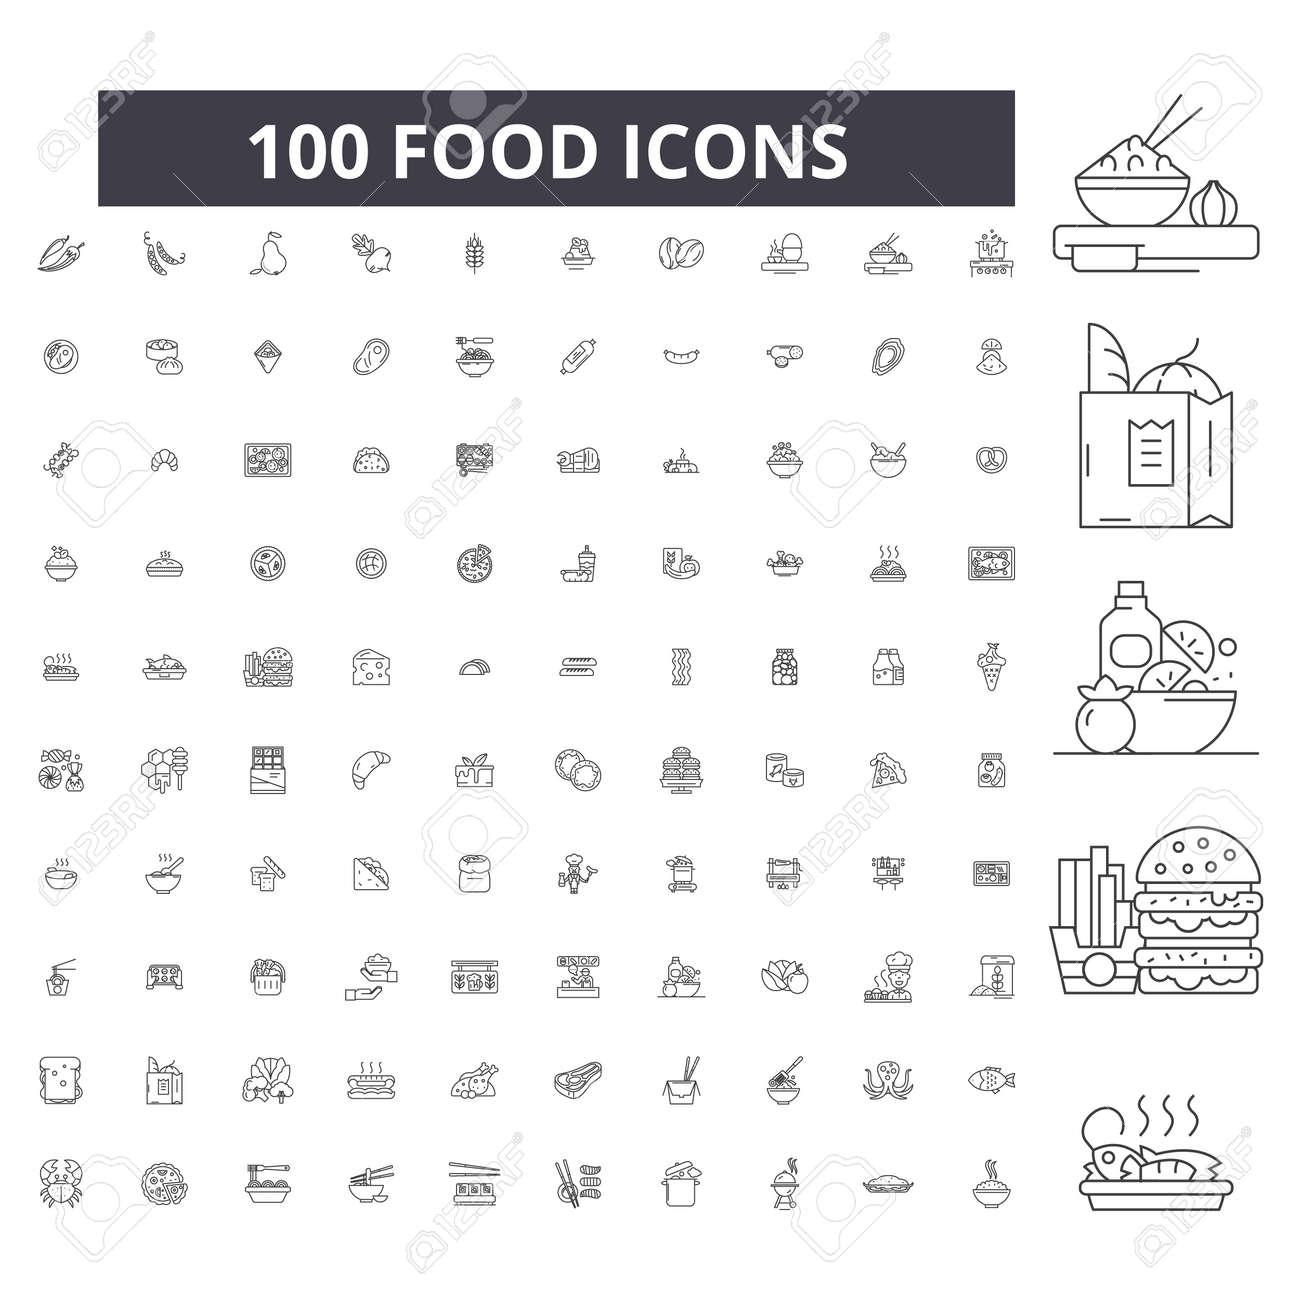 Food editable line icons, 100 vector set on white background. Food black outline illustrations, signs, symbols - 116430695